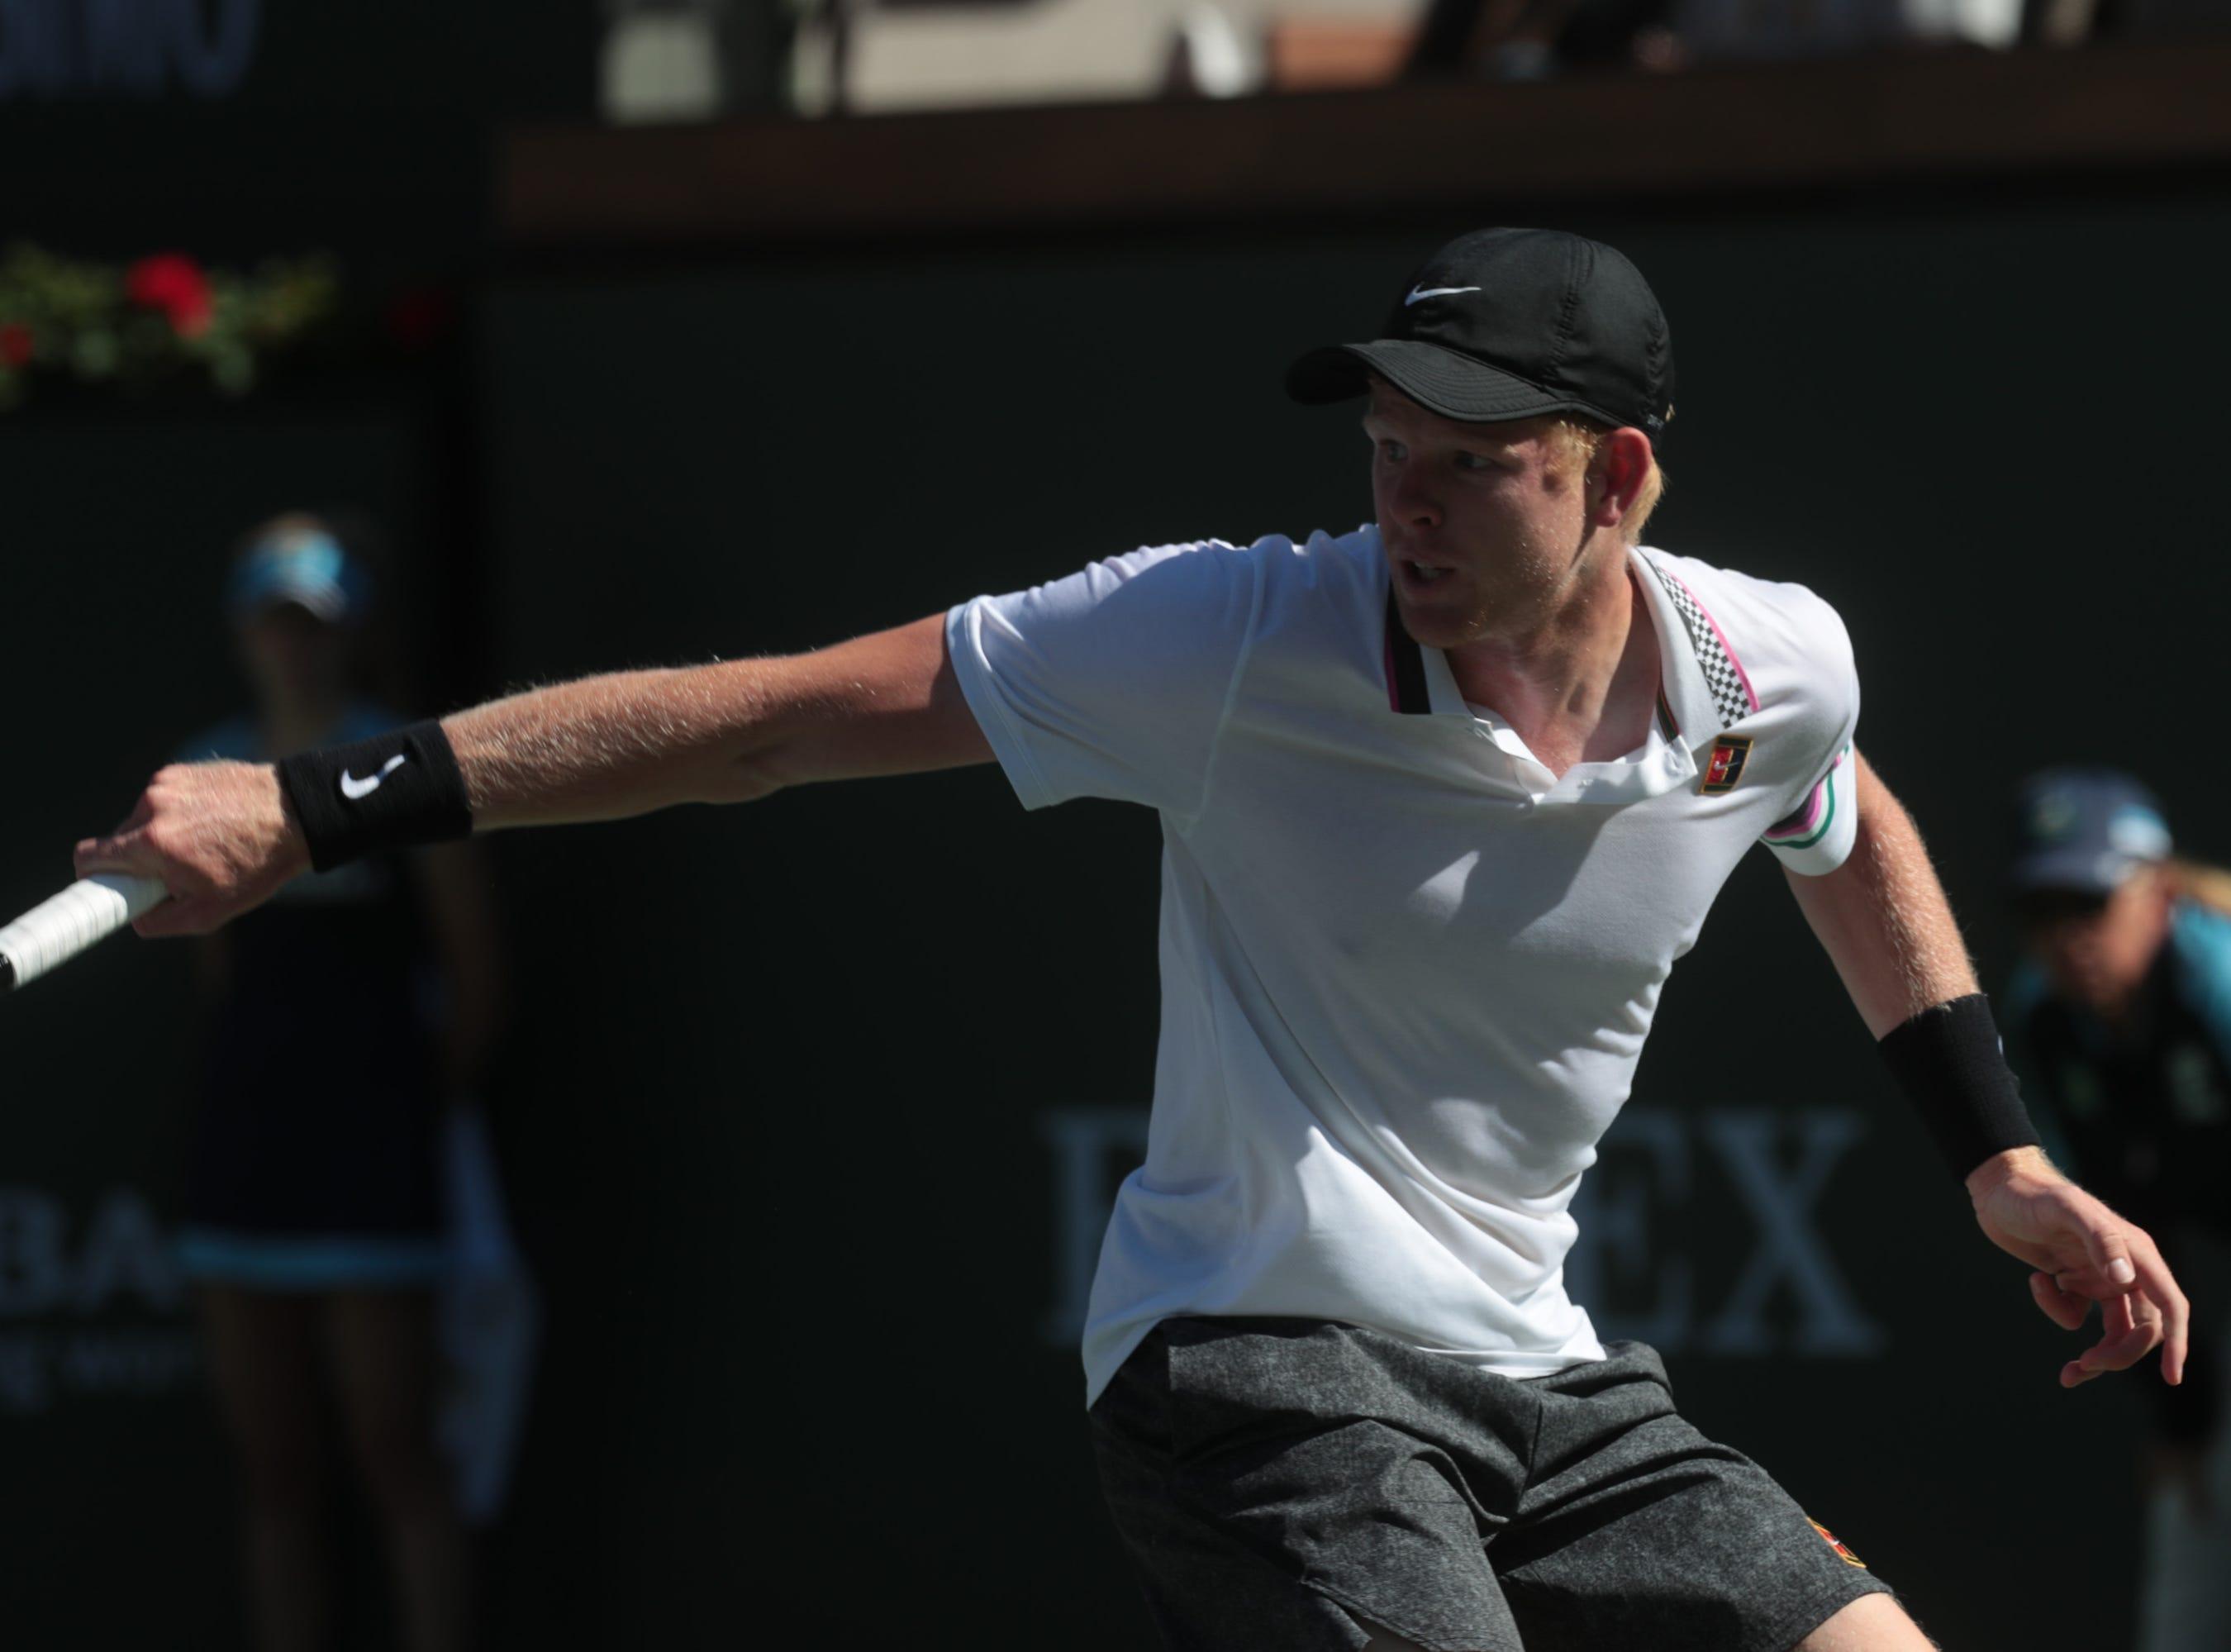 Kyle Edmund returns to Roger Federer at the BNP Paribas Open in Indian Wells, Calif., March 13, 2019.